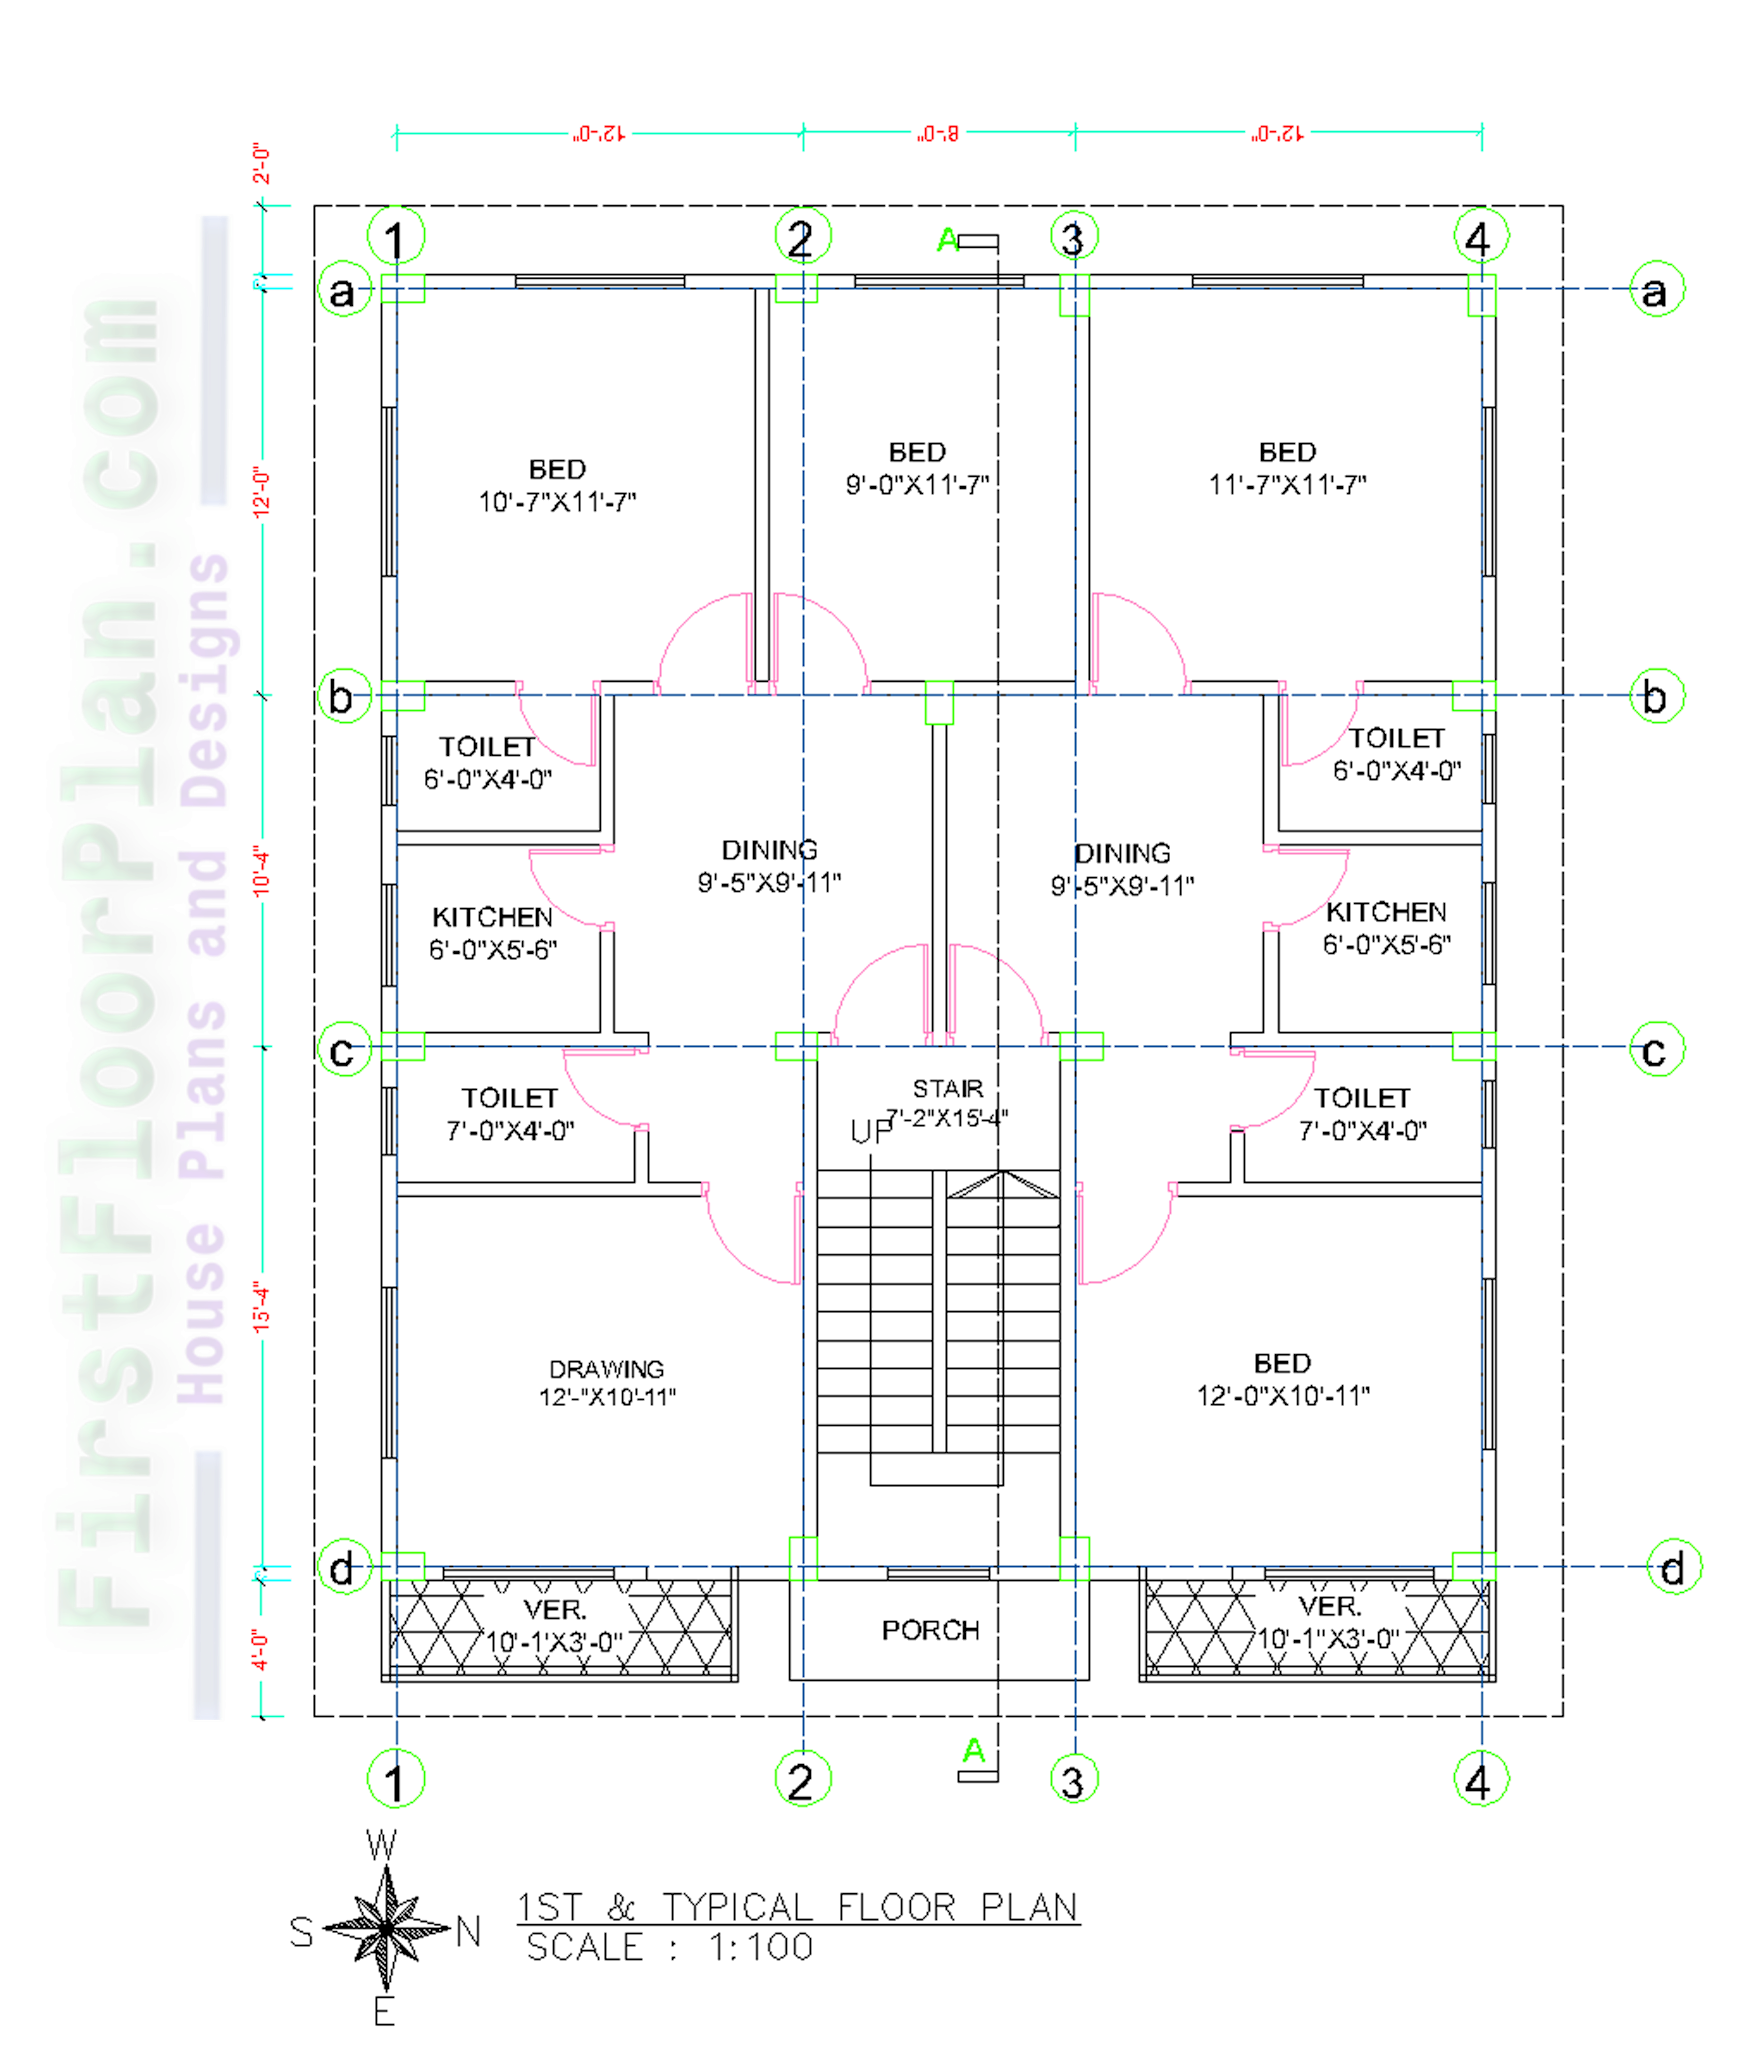 5 Story Apartment Building Floor Plan